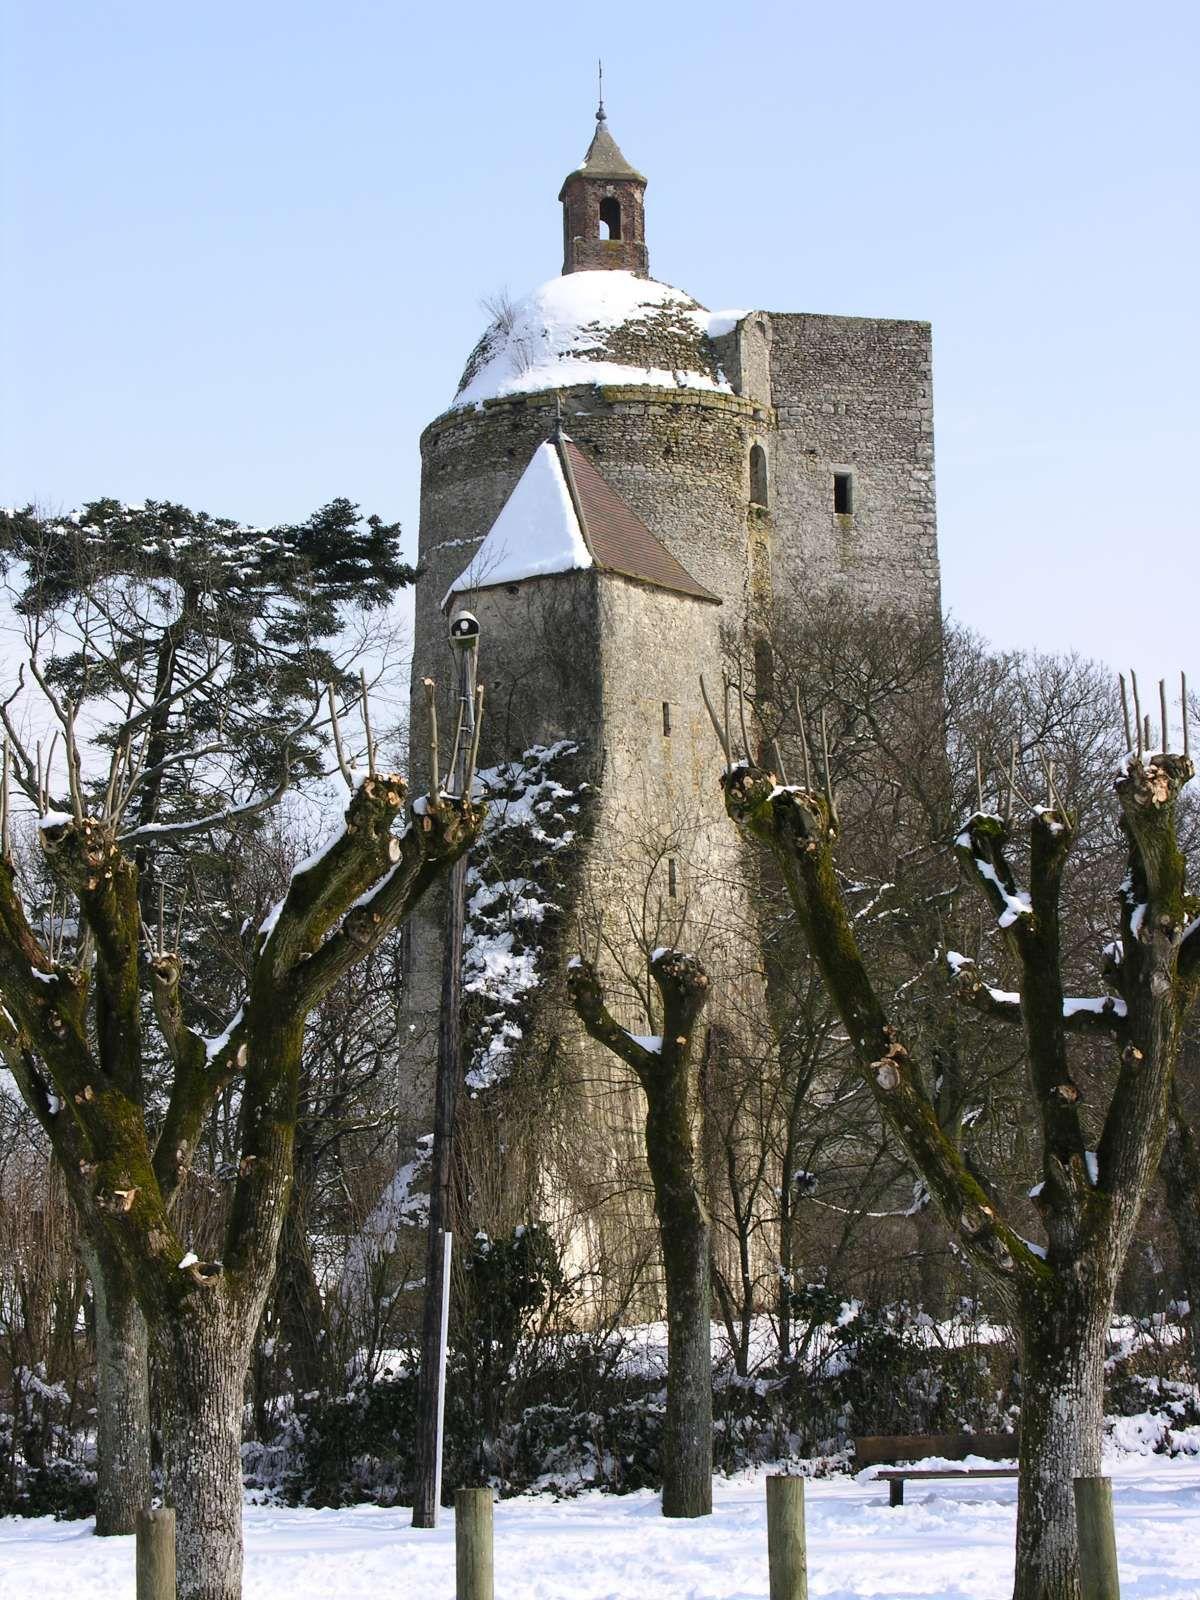 photo dungeon of auneau france beautiful places france castle places. Black Bedroom Furniture Sets. Home Design Ideas